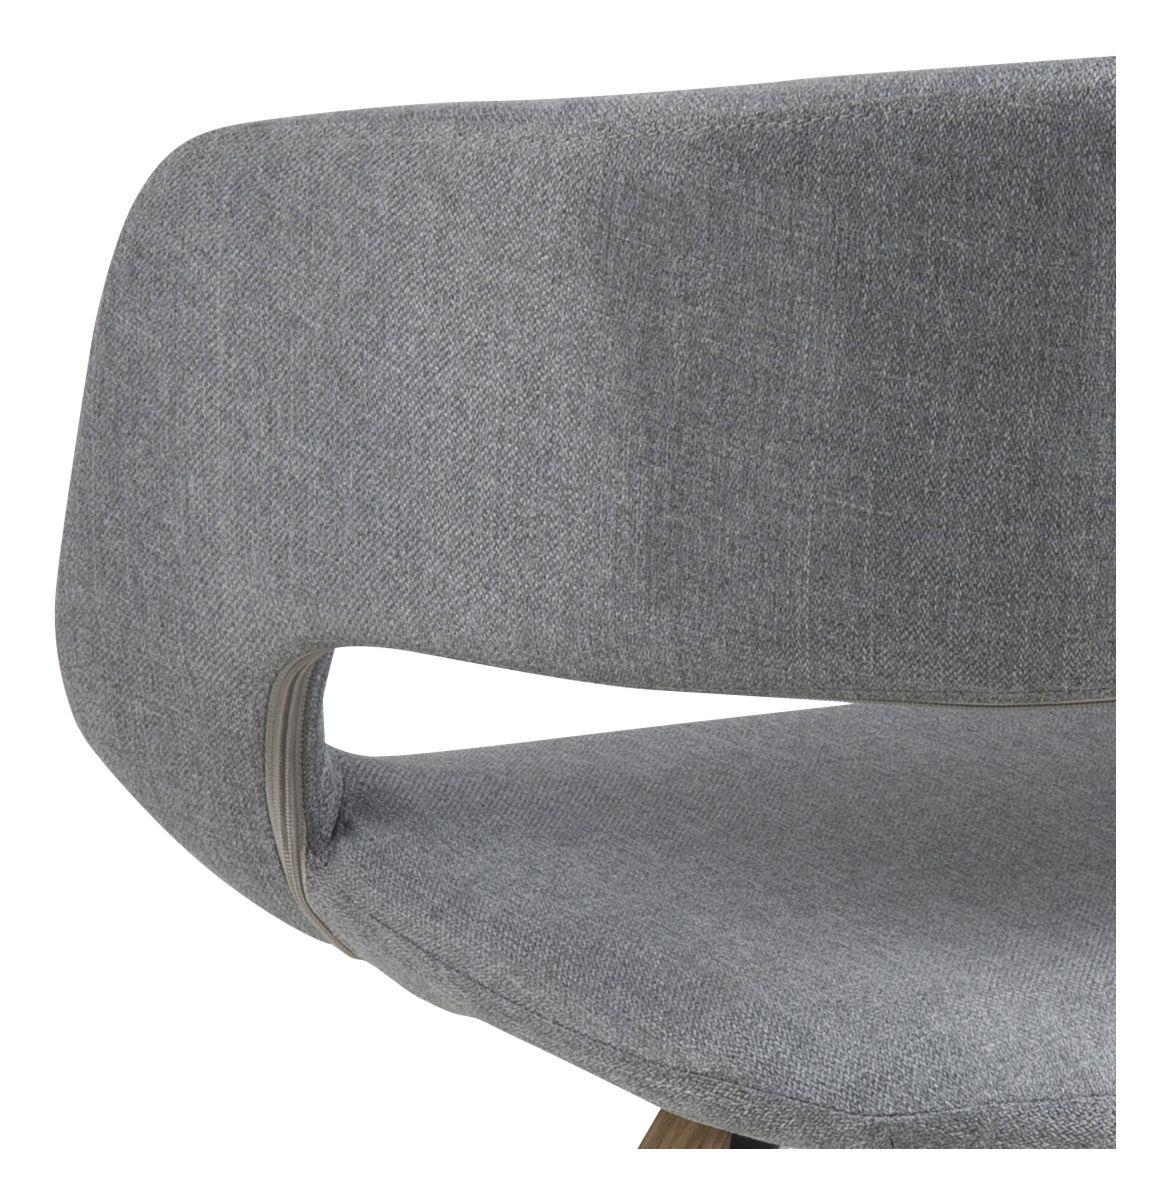 Kline Spisebordsstol m/centerben - Lysegrå stof - Spisebordsstol med centerben